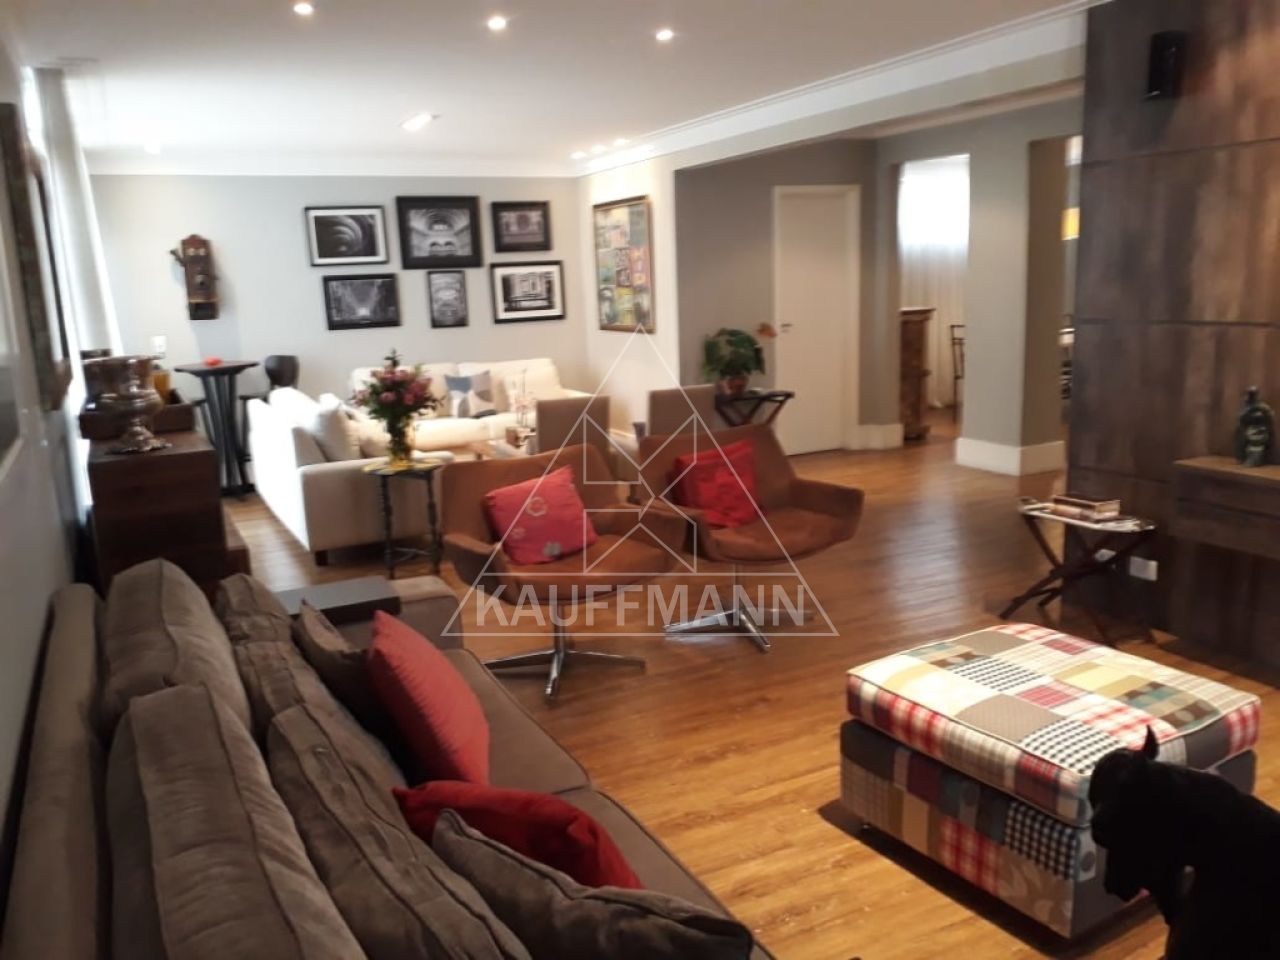 apartamento-venda-sao-paulo-jardim-paulista-3dormitorios-3suites-1vaga-174m2-Foto1